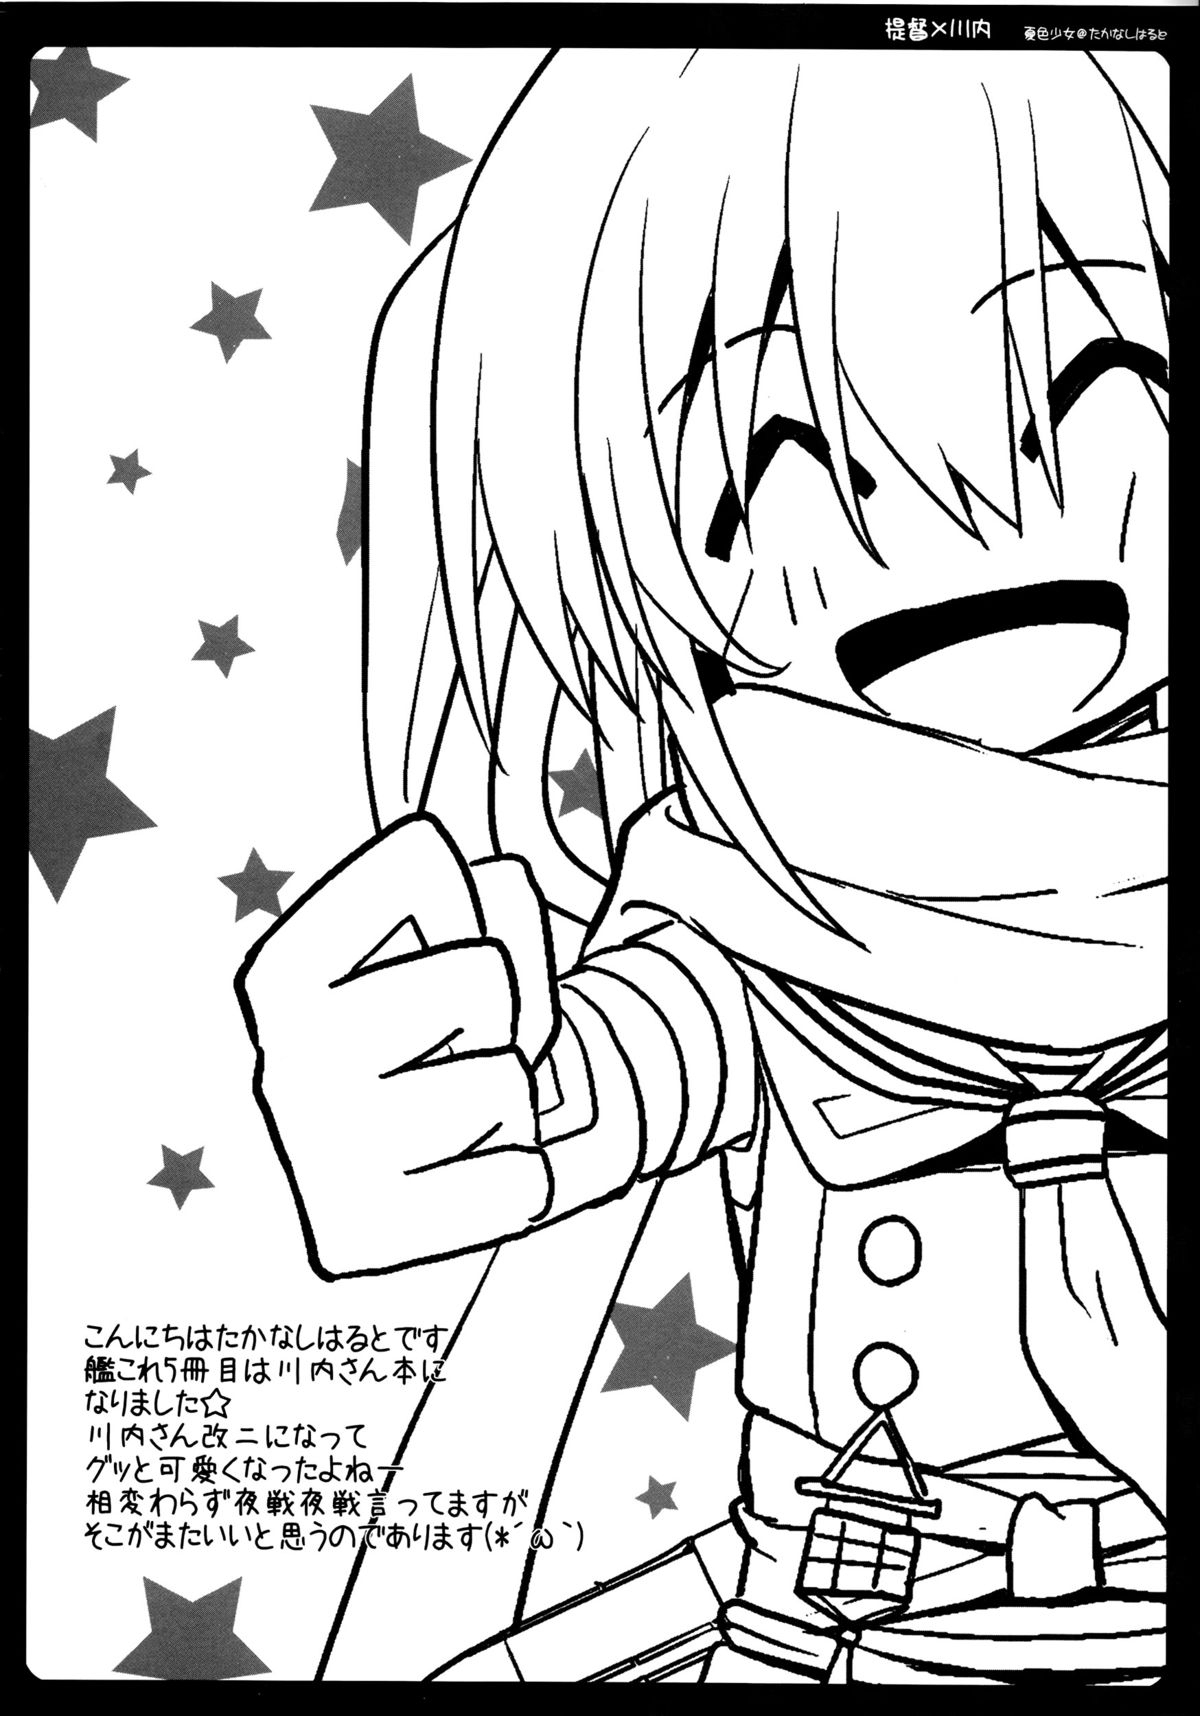 Hình ảnh  trong bài viết Watashi o Yasen ni Tsuretette